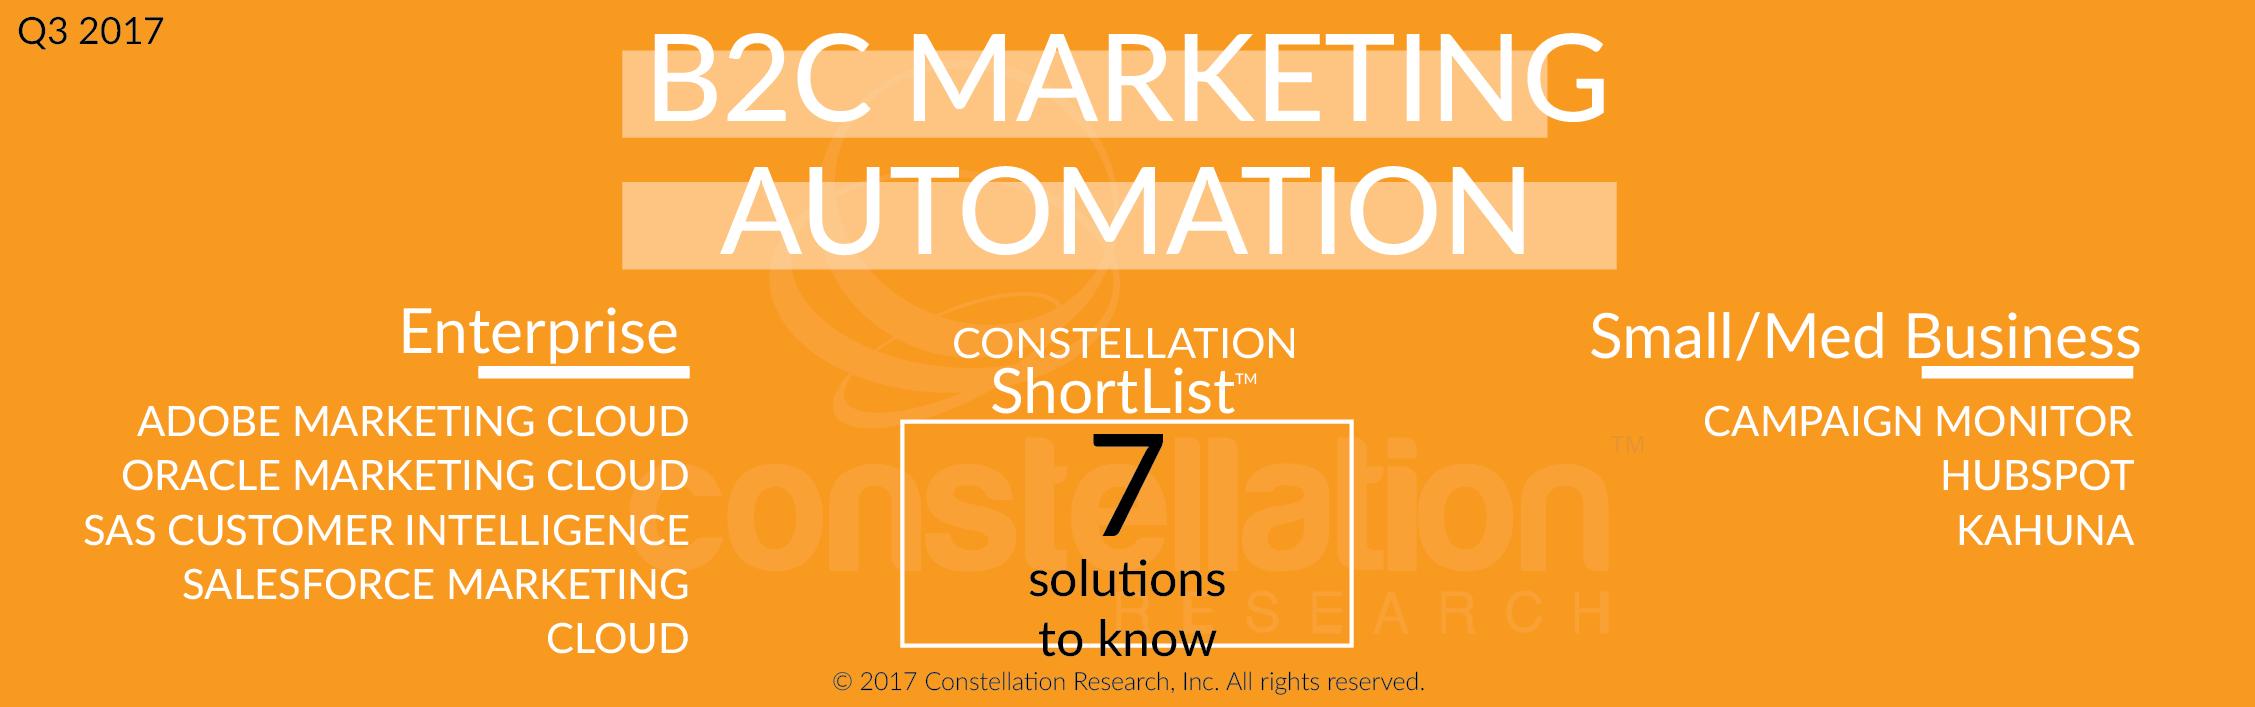 Constellation ShortList B2C Marketing Automation